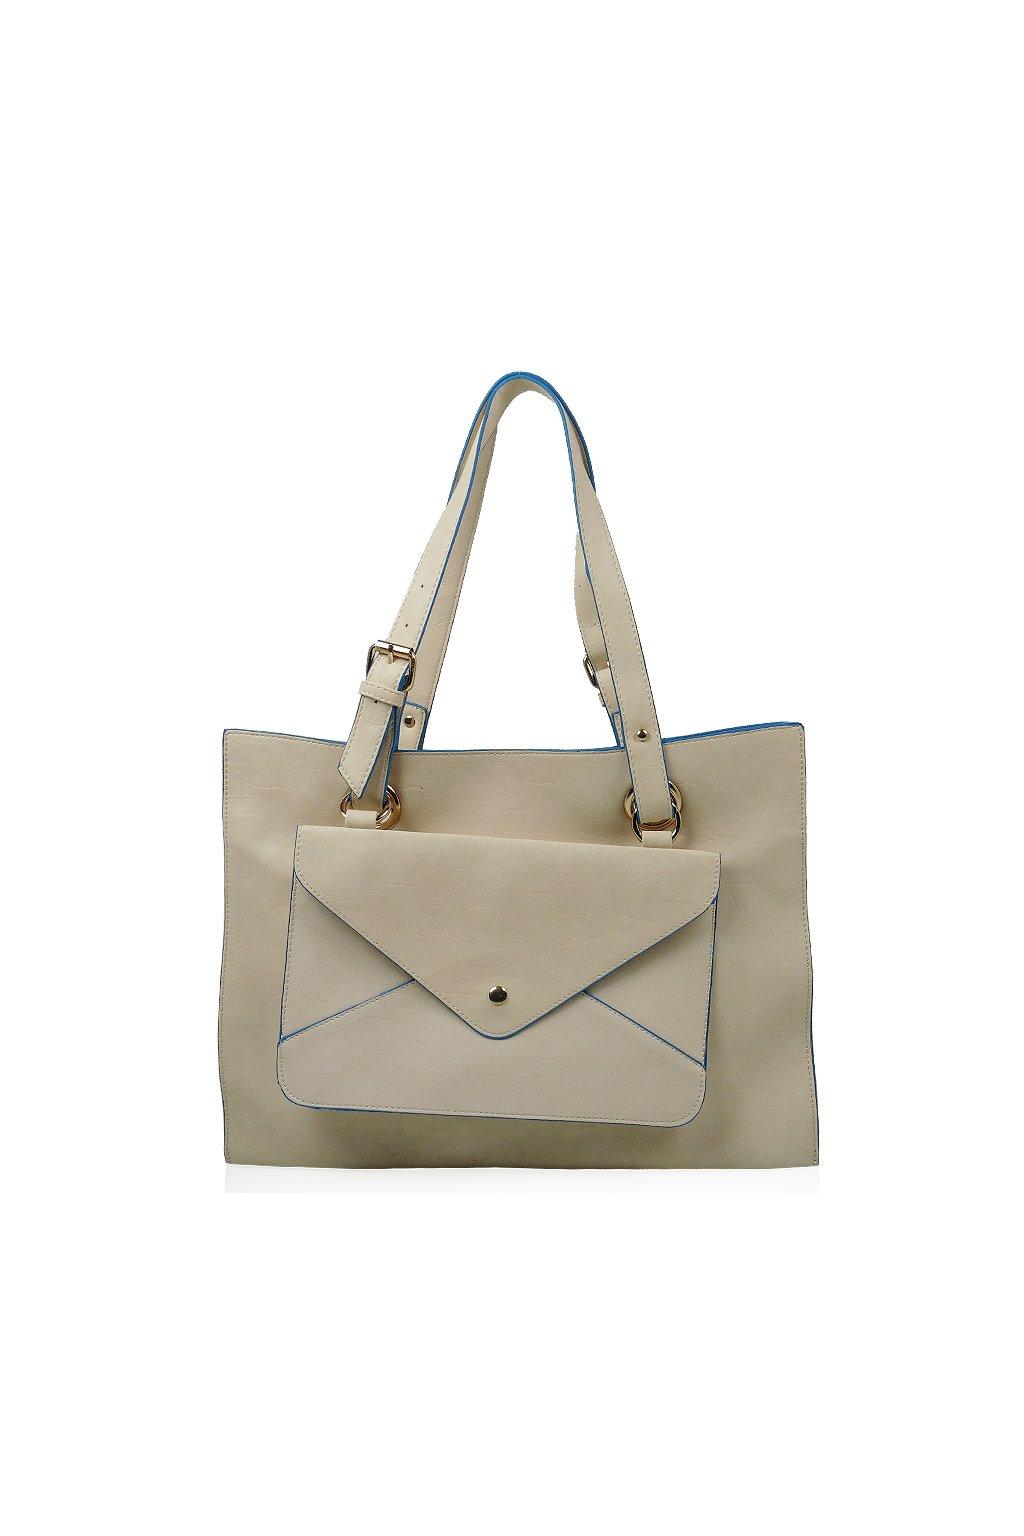 Béžová kabelka Just Glamour  65f85c4bc29